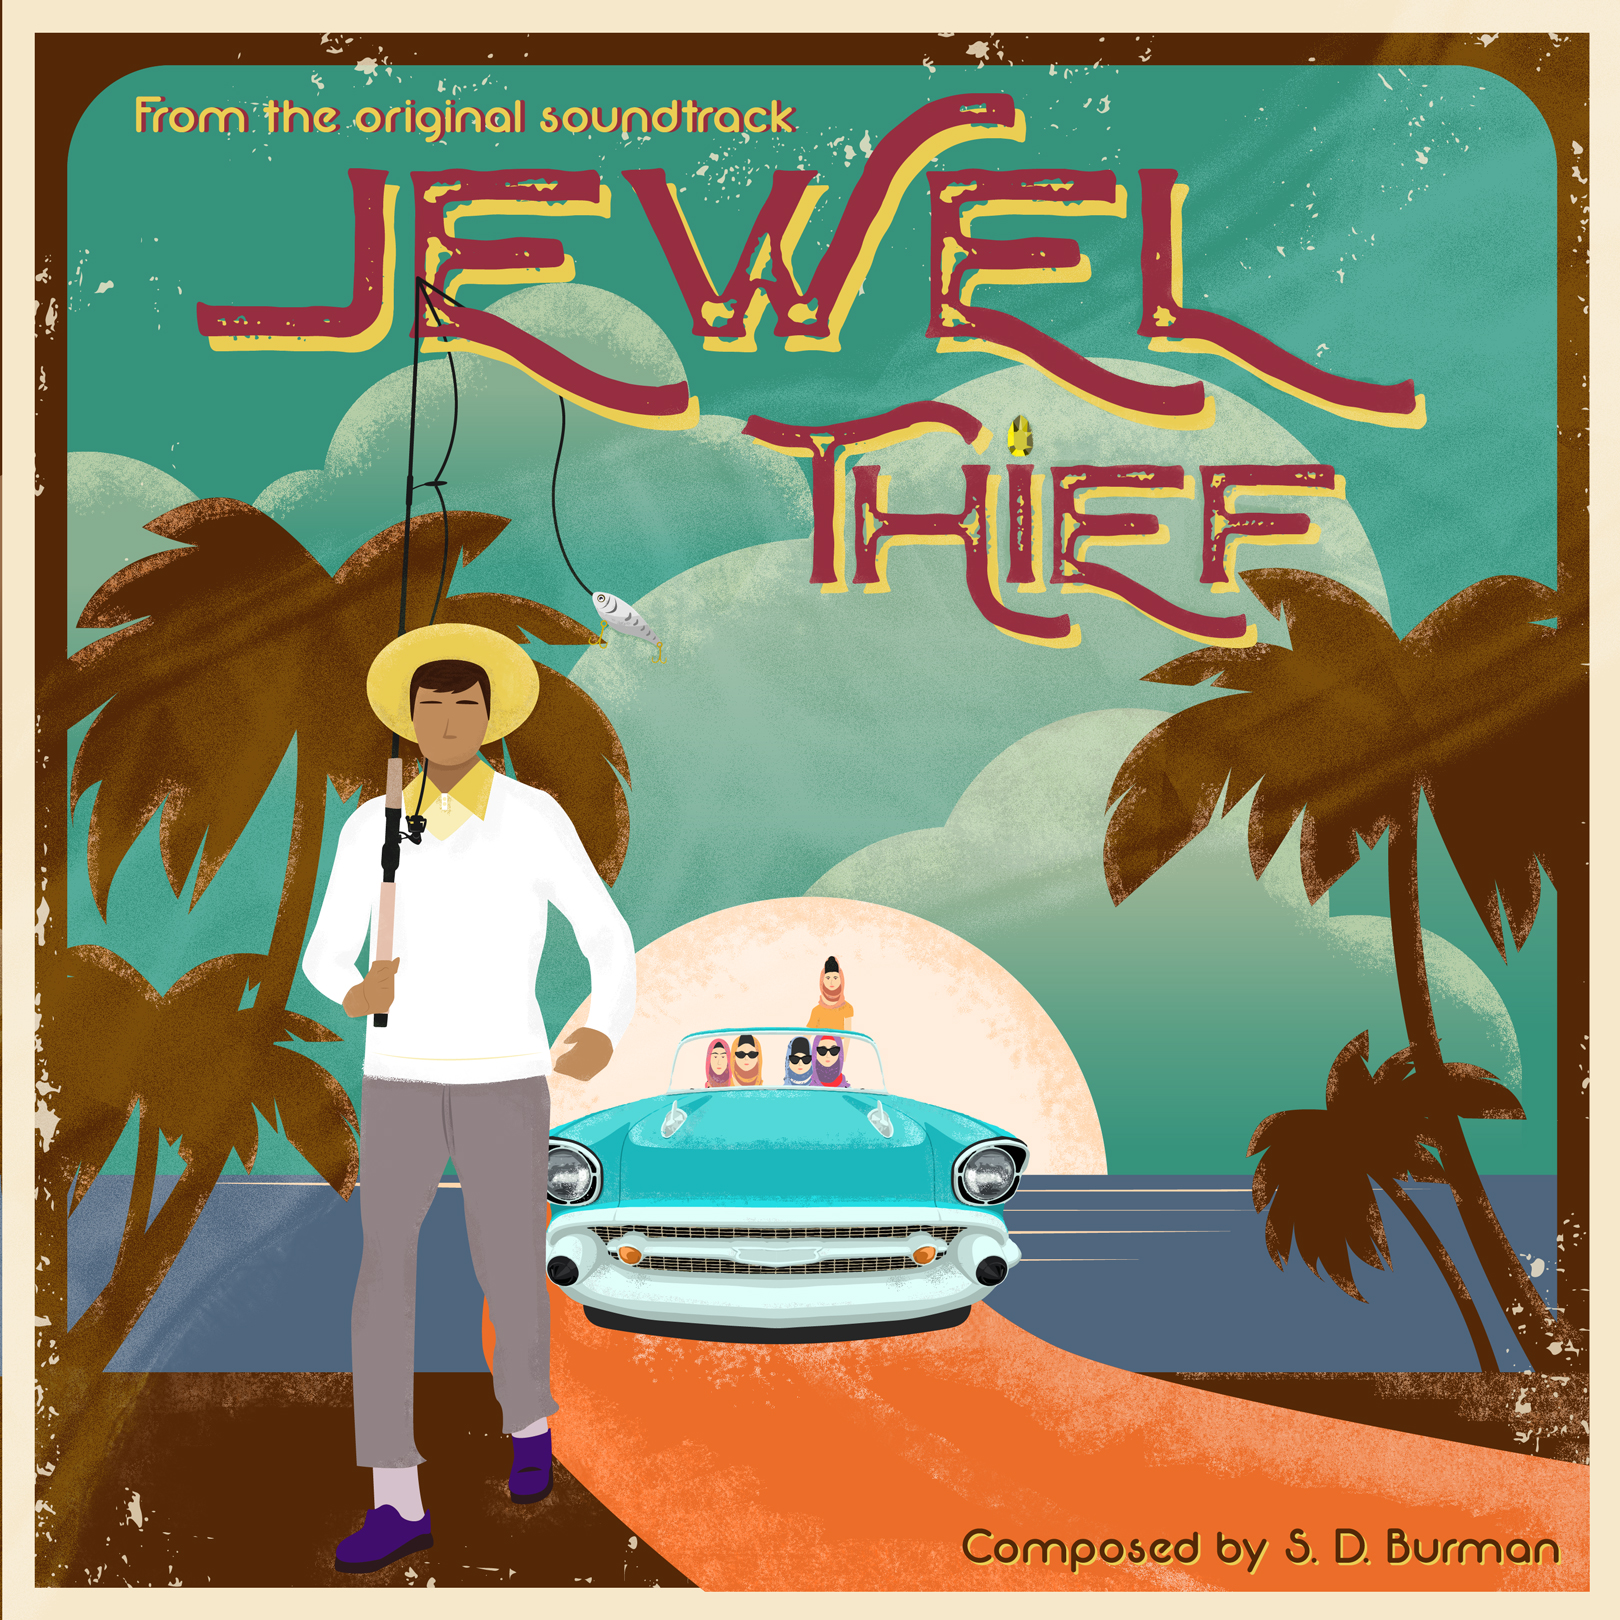 Jewel-Thief-[1967]-album-cover-art.jpg